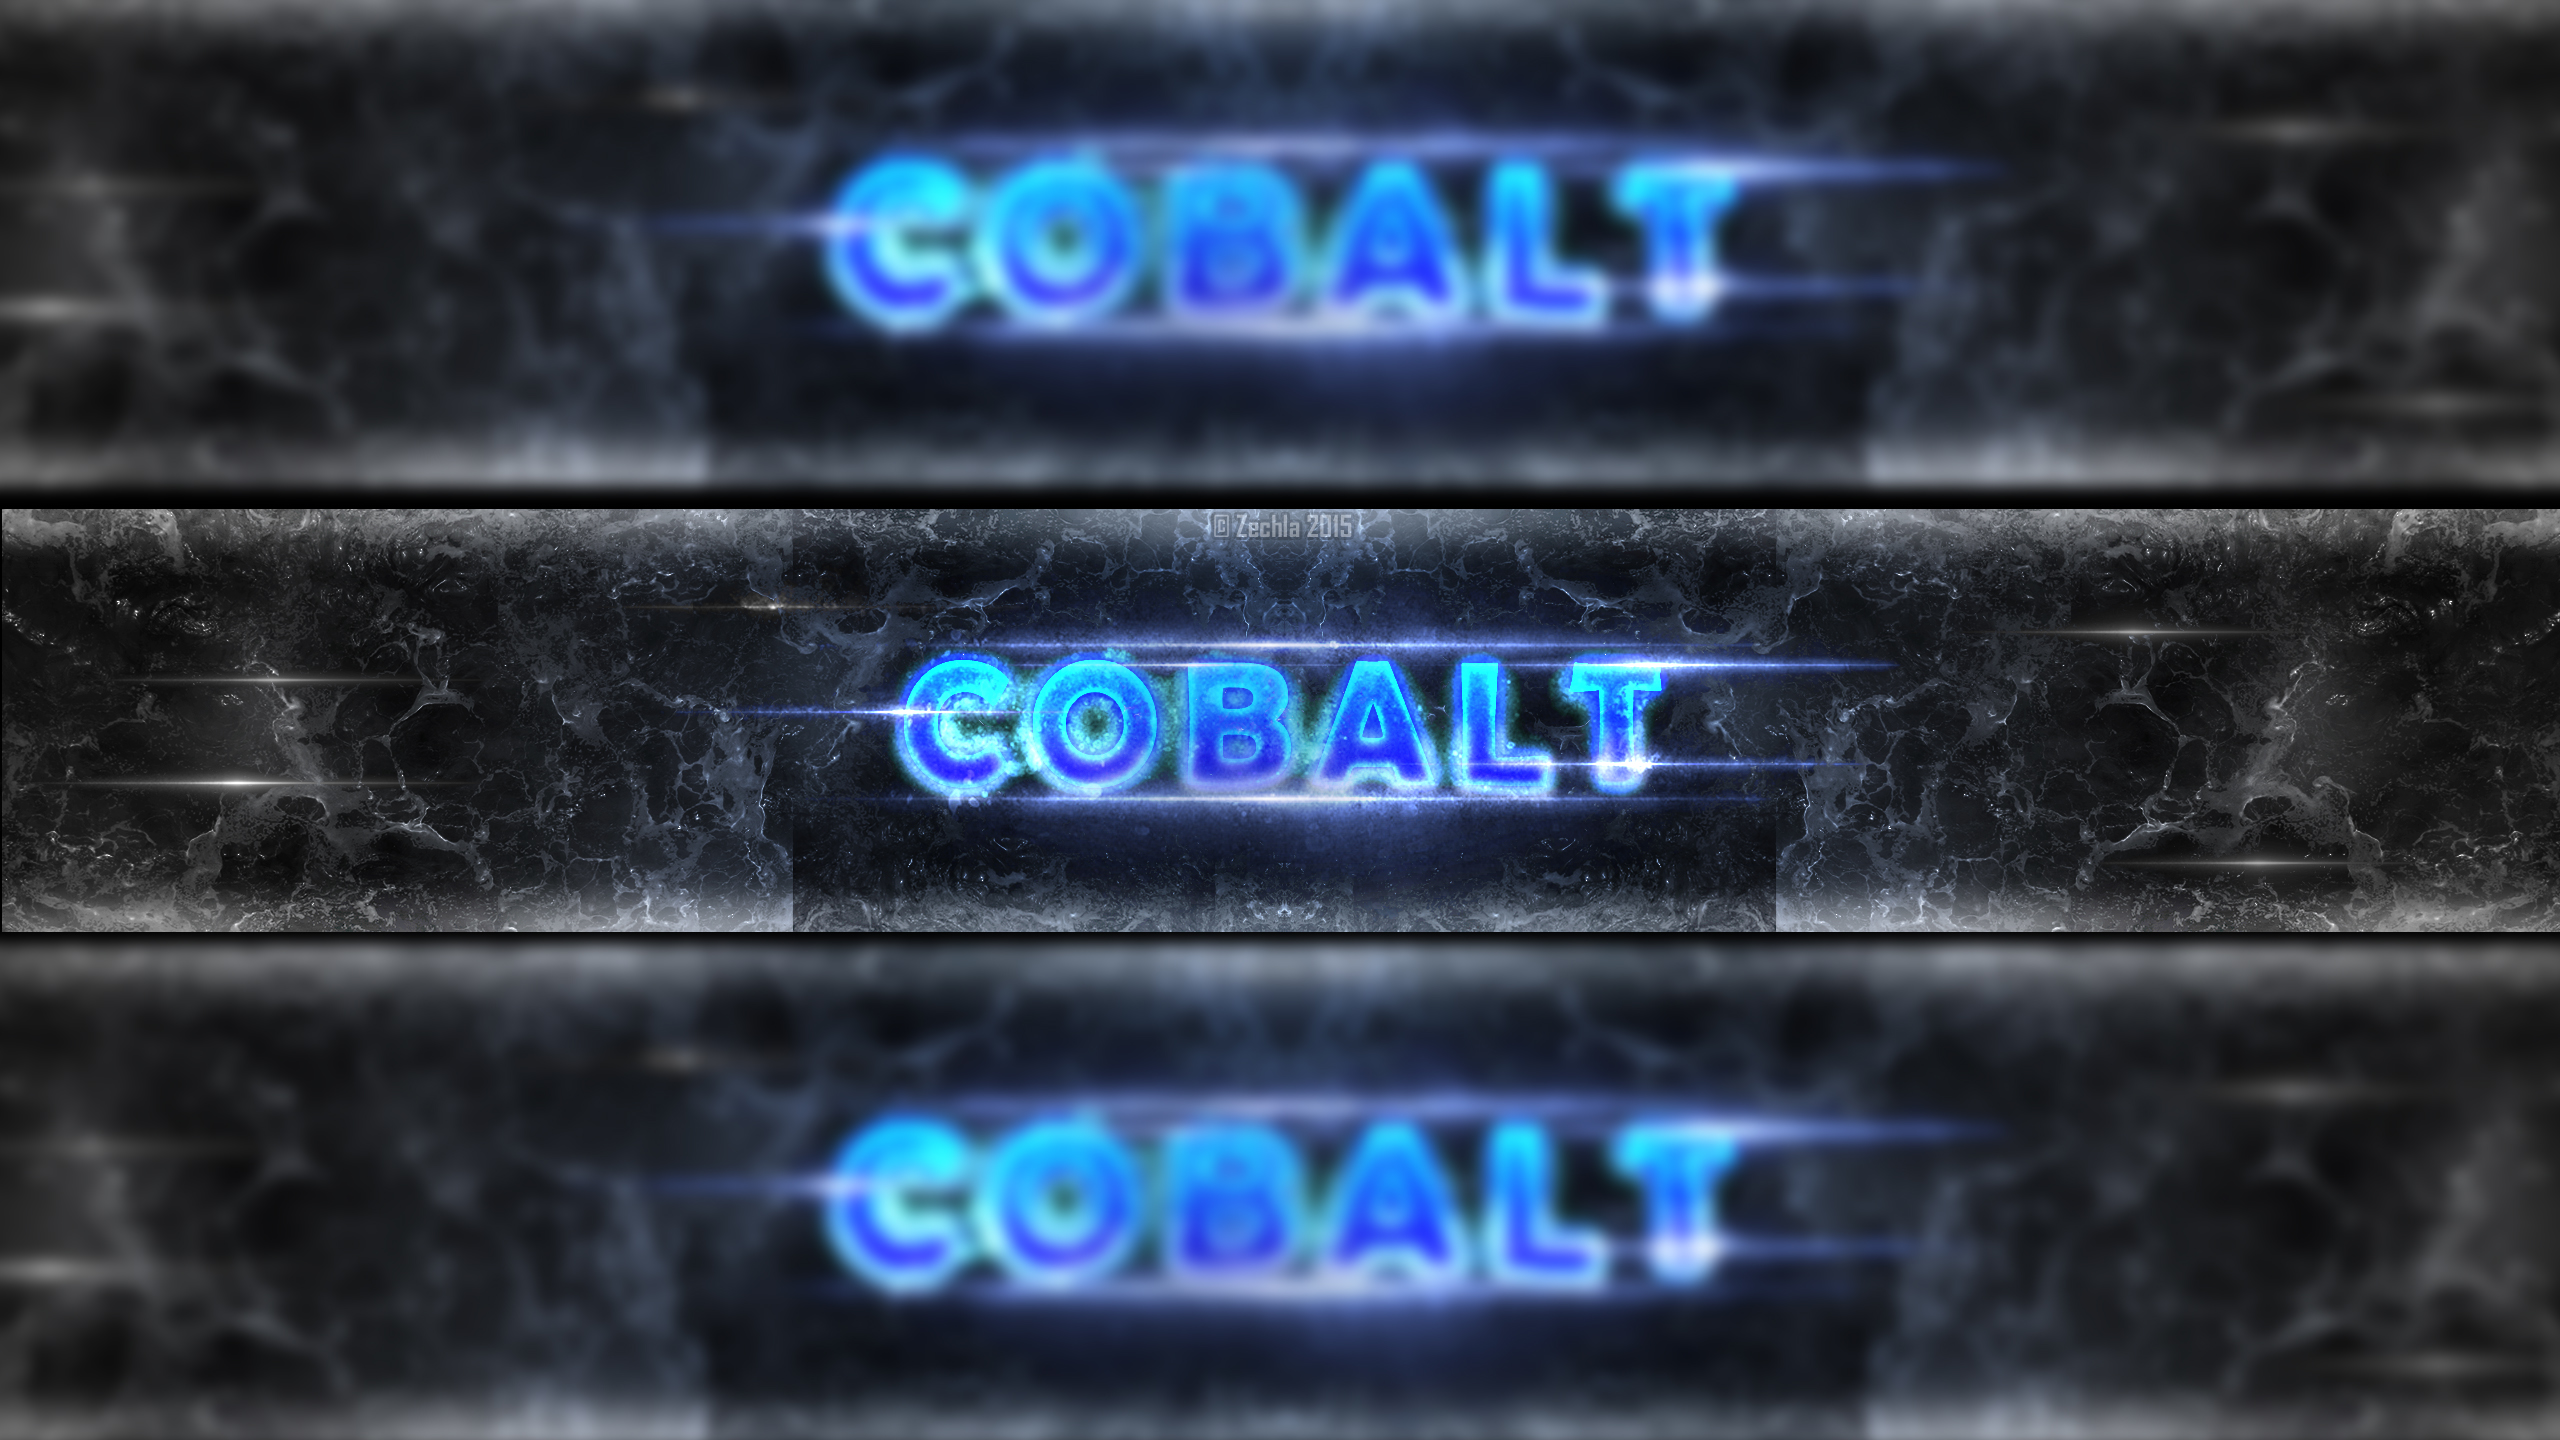 Cobalt's Banner